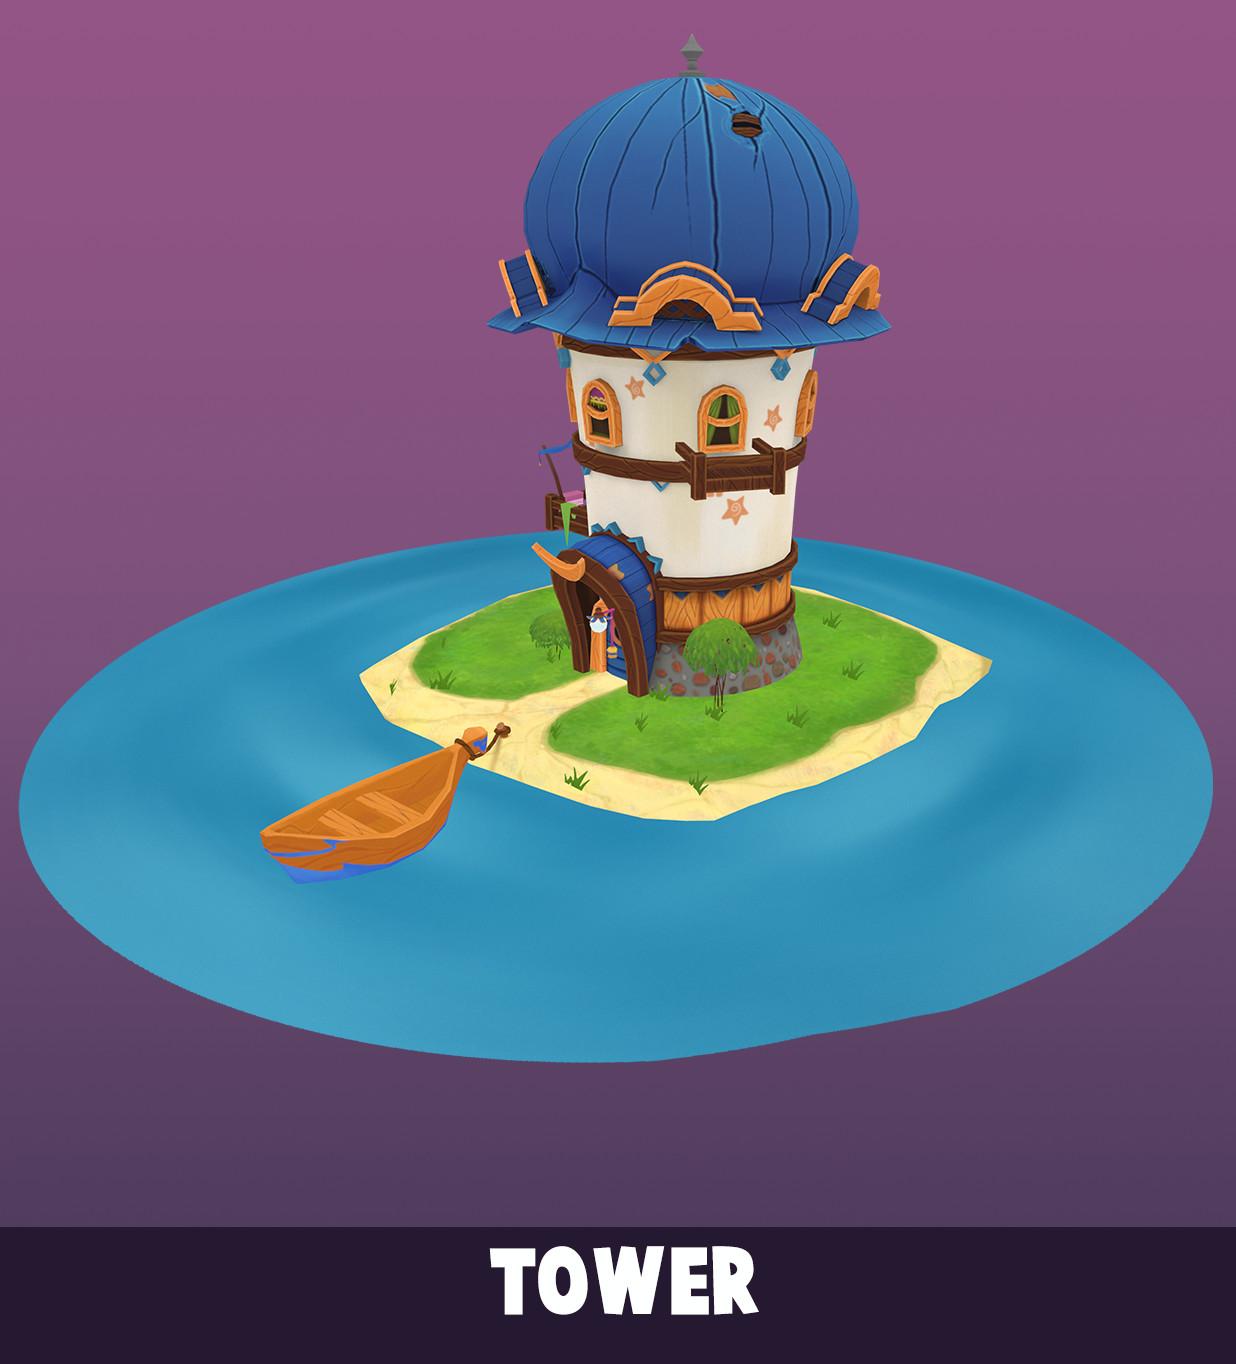 Caio perez torre render3